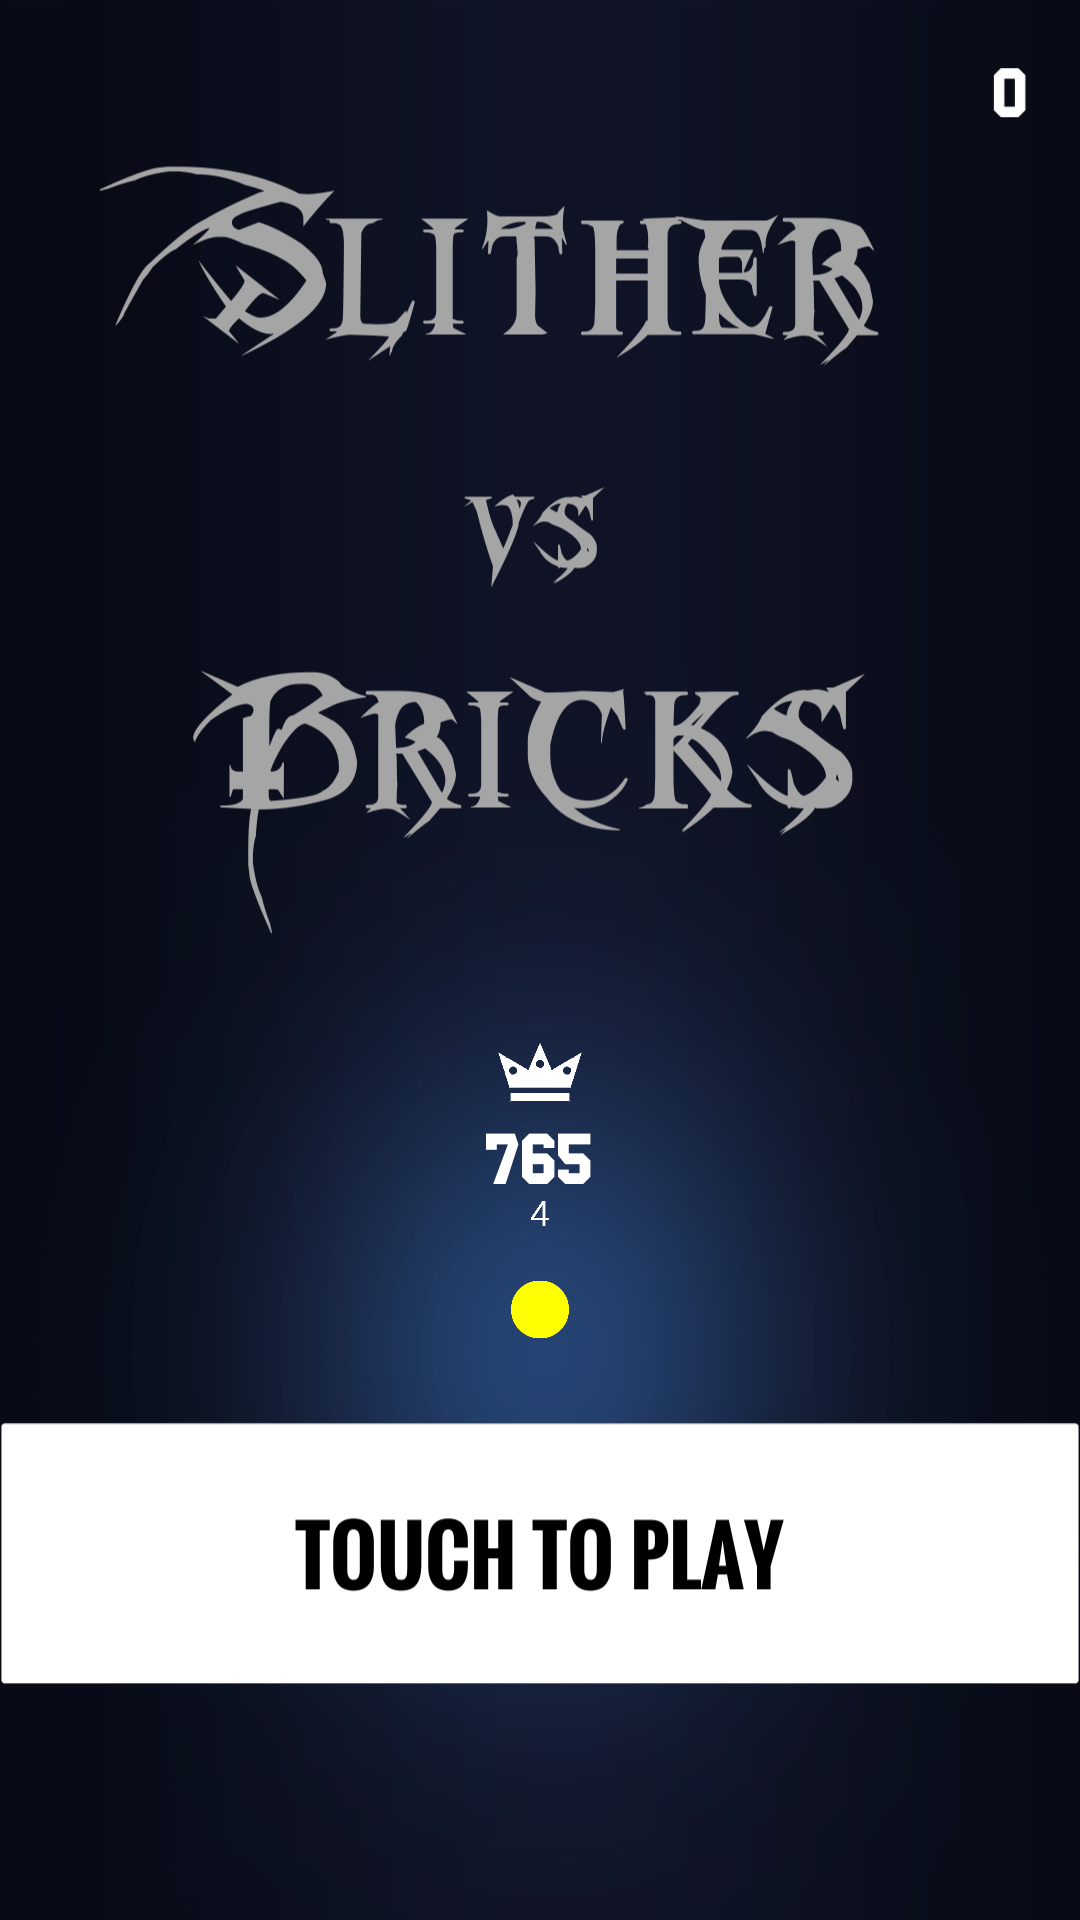 Slither vs Bricks